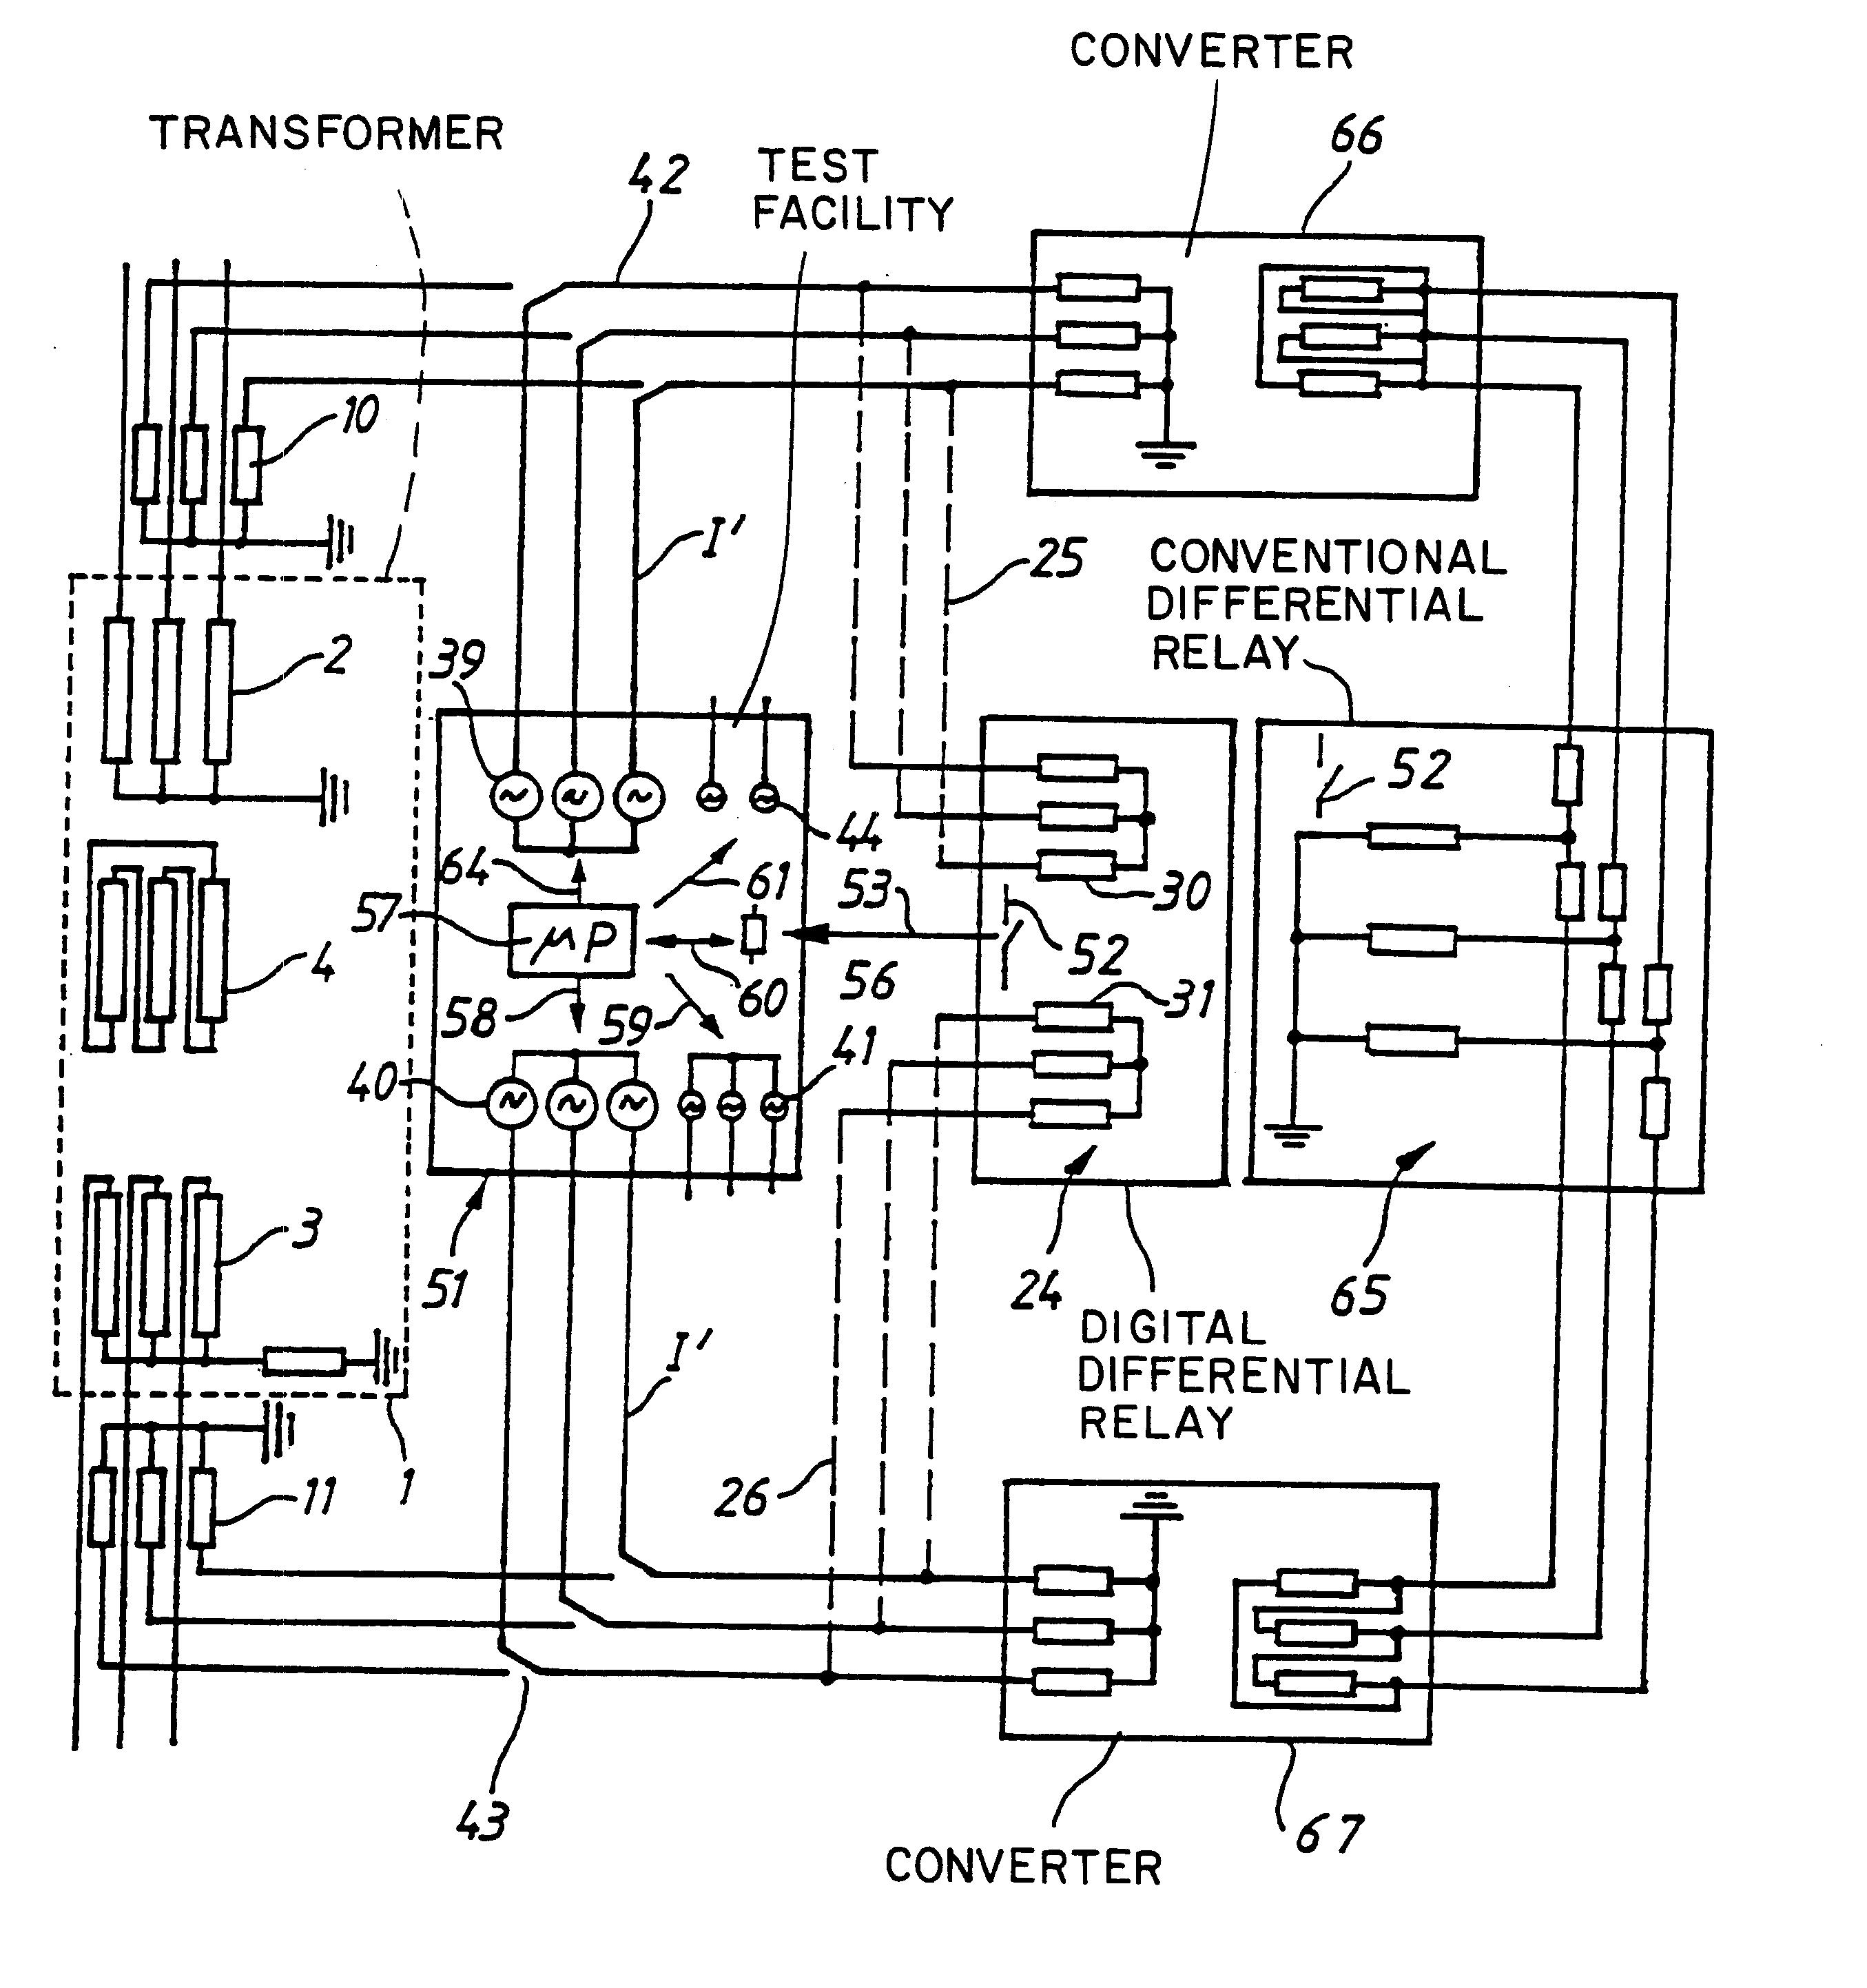 Patent US 6,396,279 B1